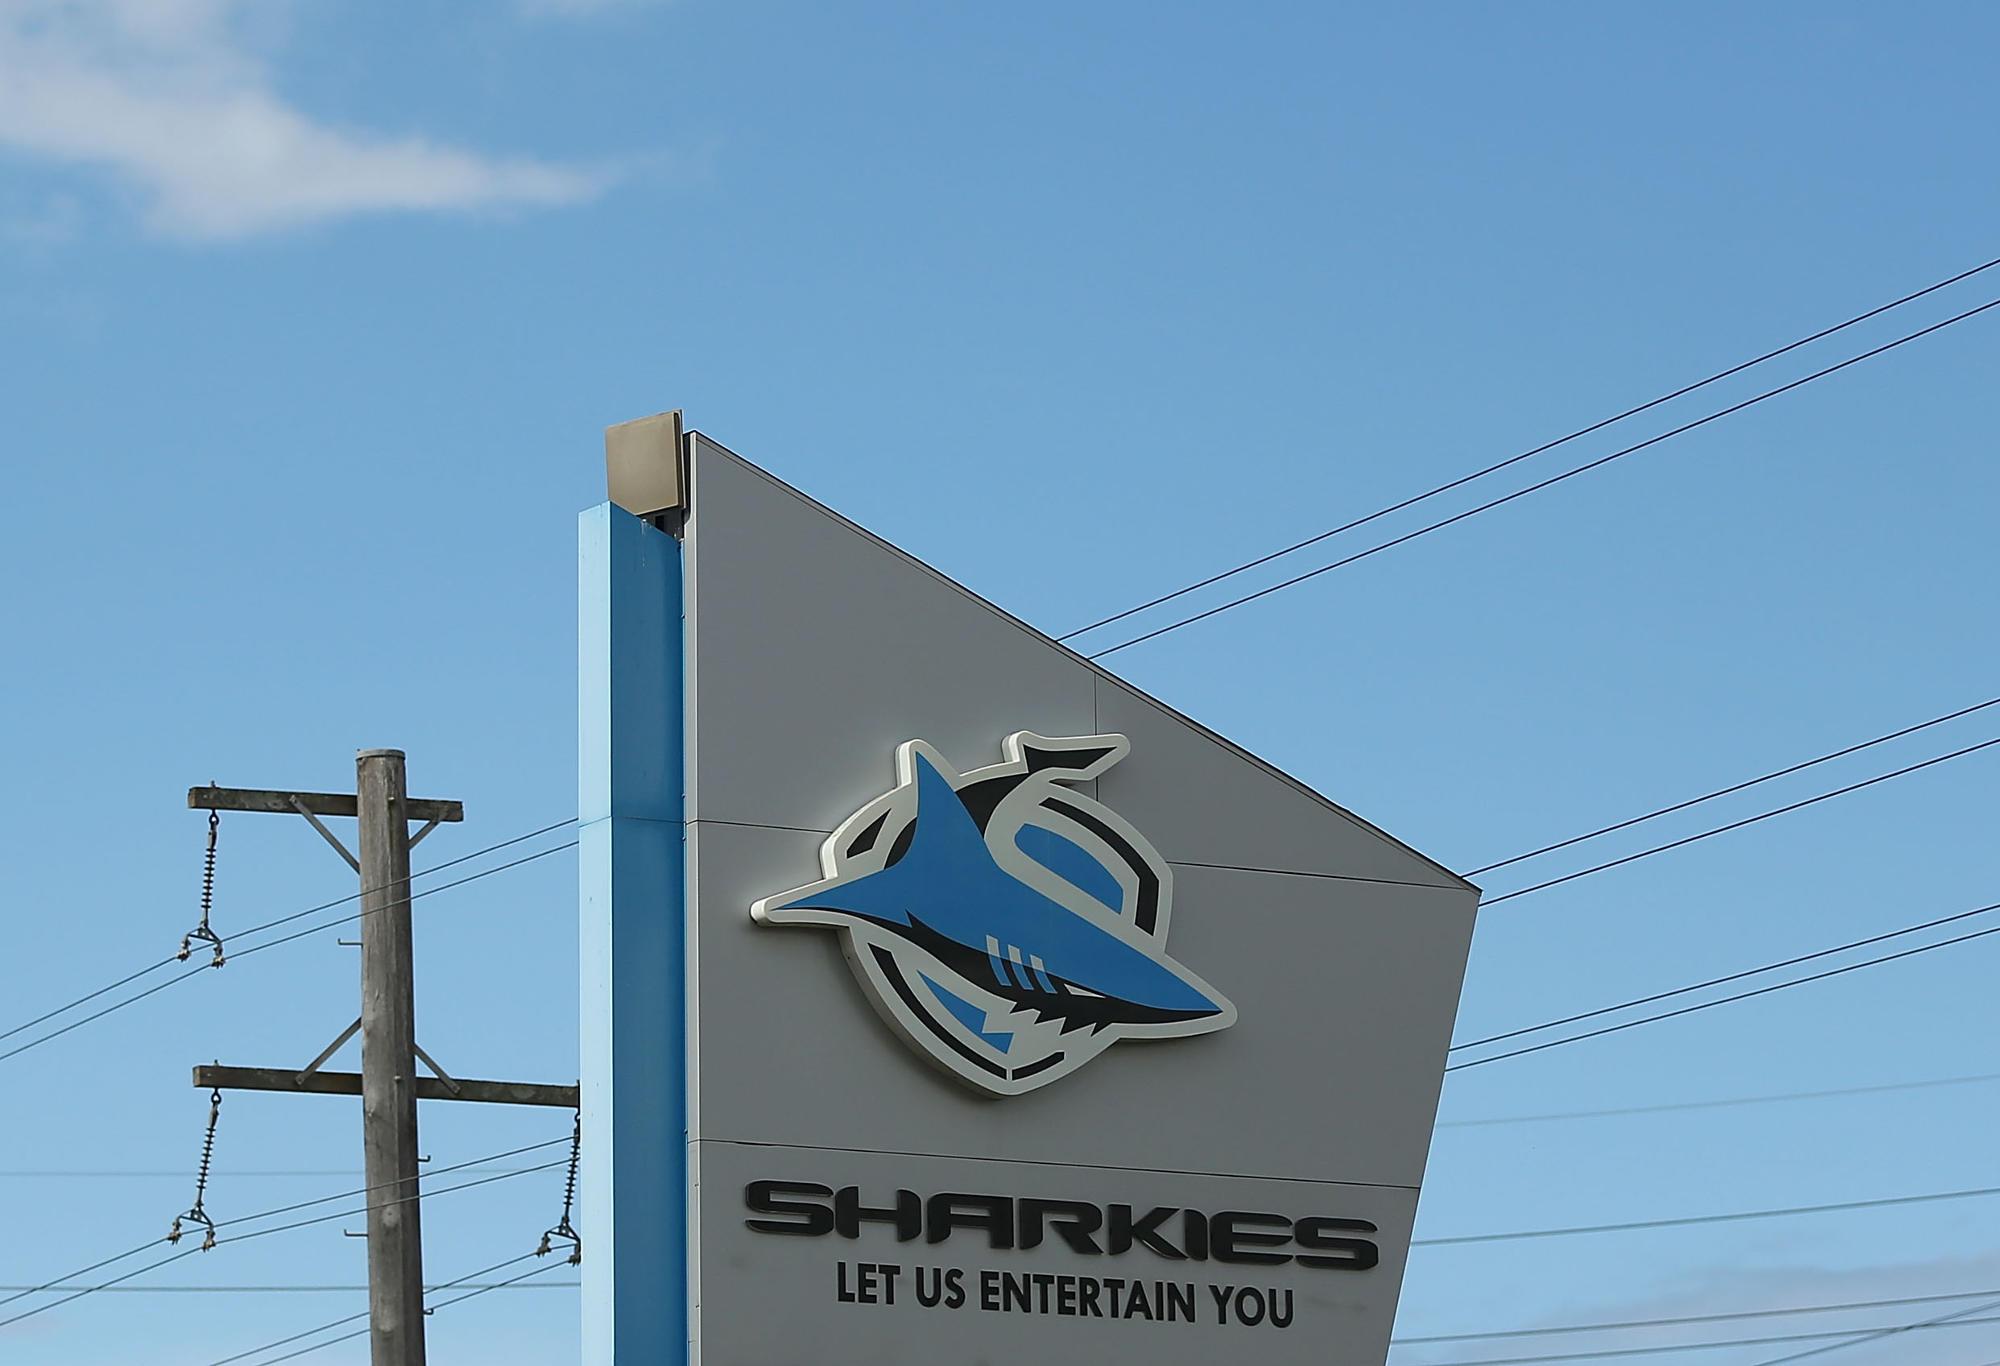 Sharks generic